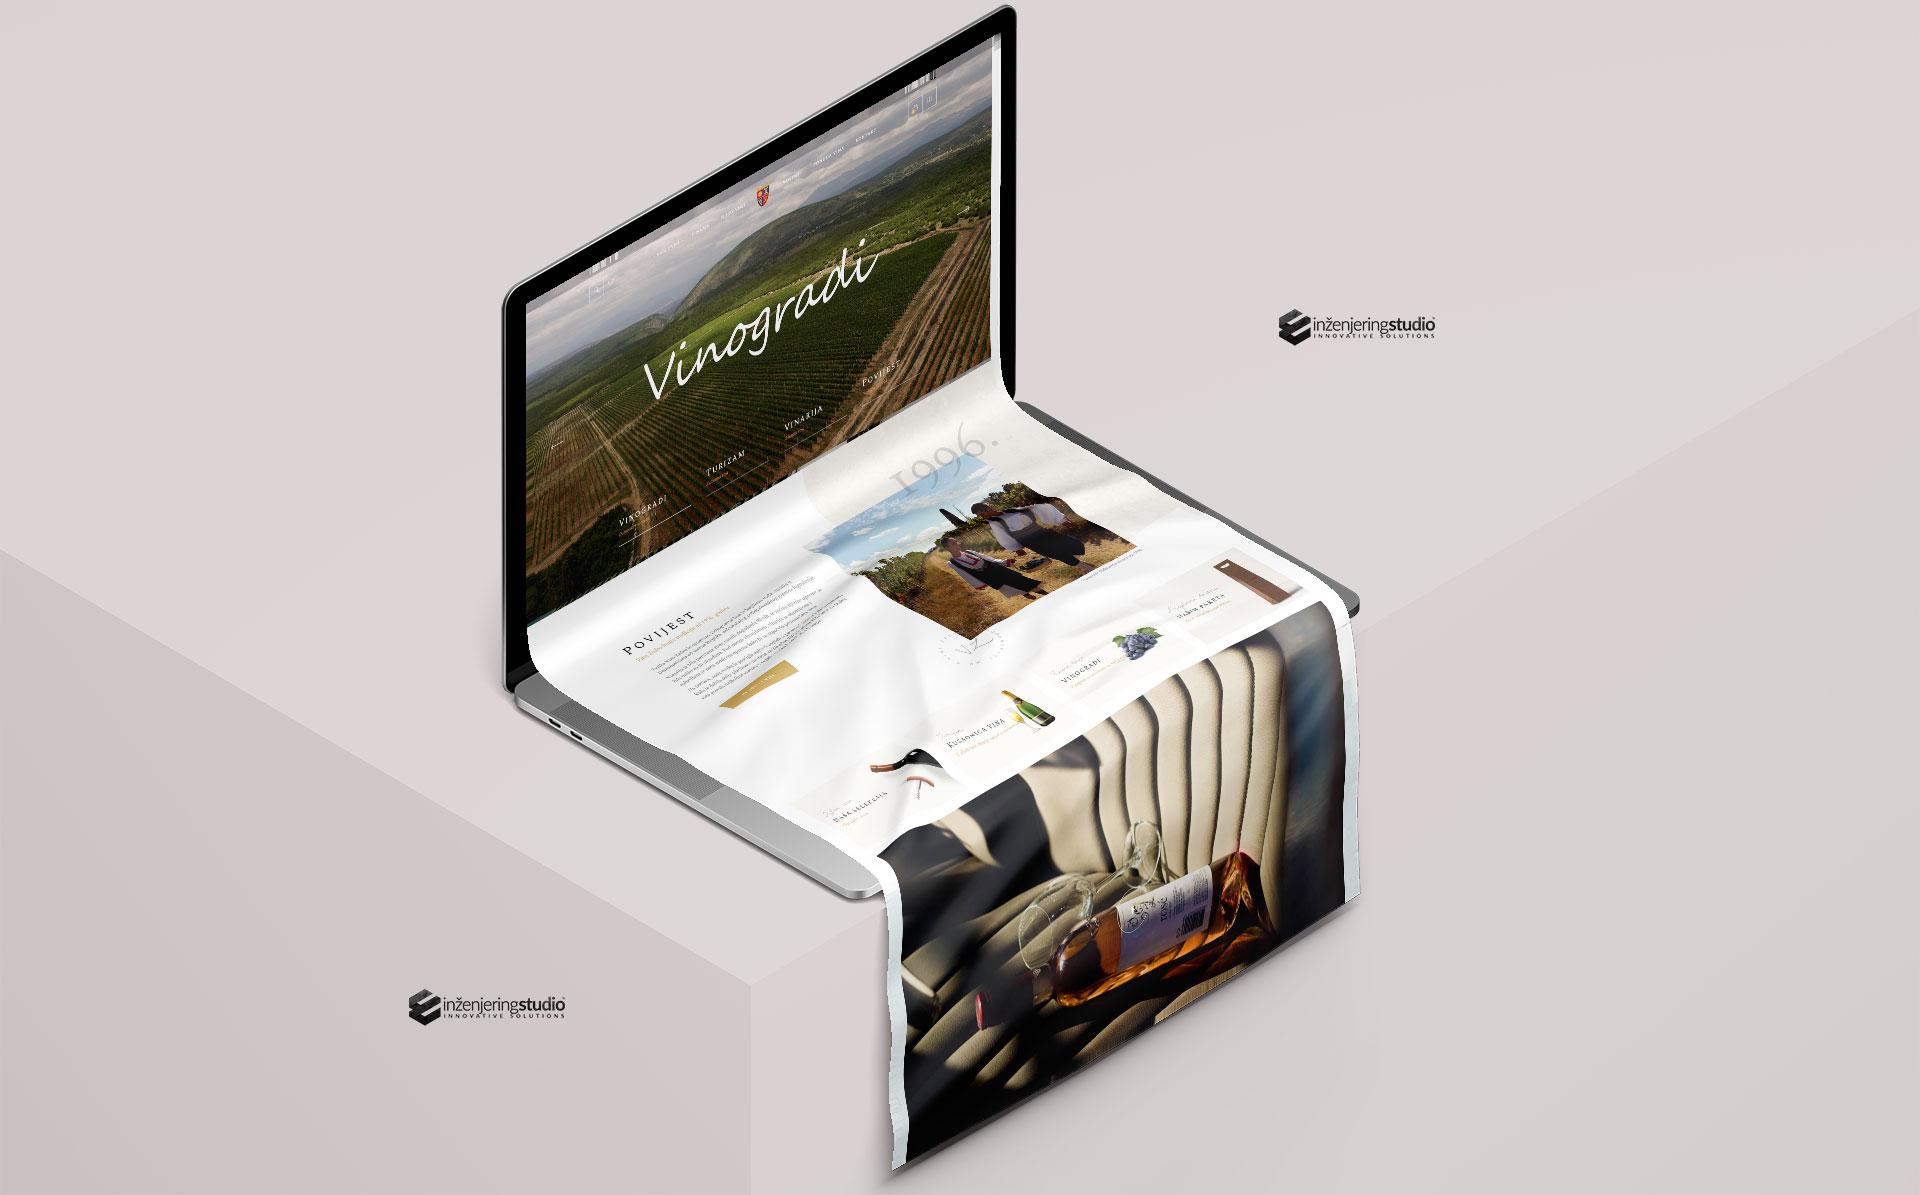 PREZENTACIJA-WEB design by einzenjering studio